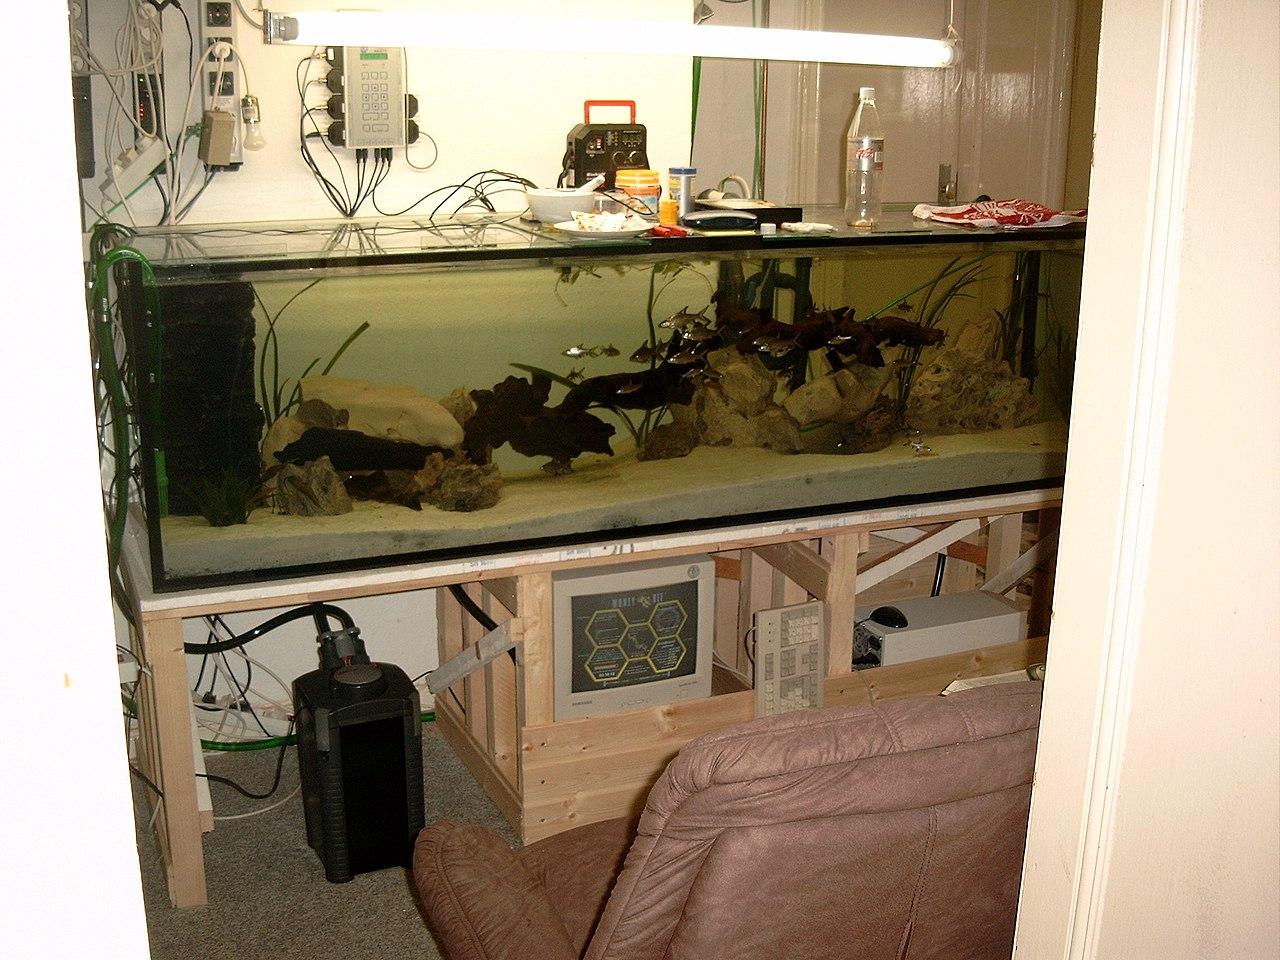 file aquarium wikimedia commons. Black Bedroom Furniture Sets. Home Design Ideas